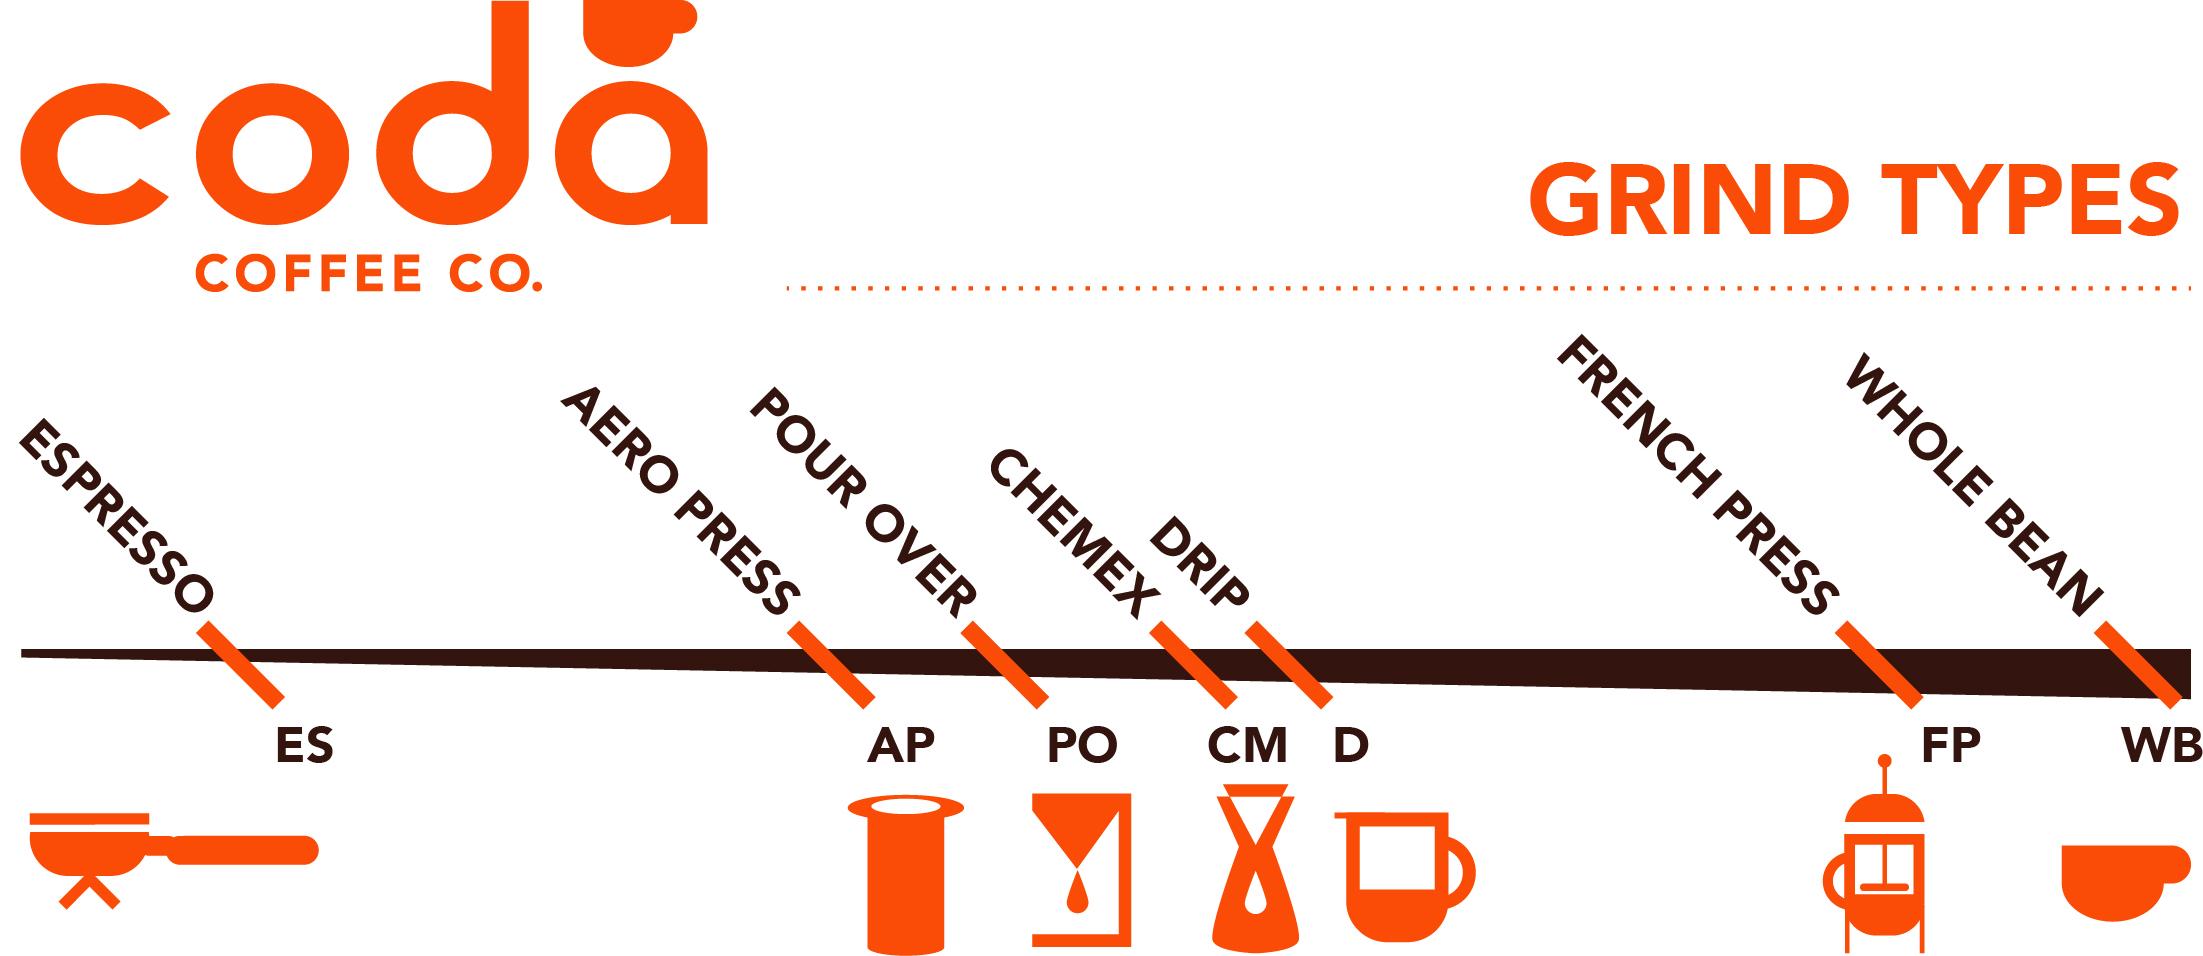 Coda Coffee Company Grind Guide